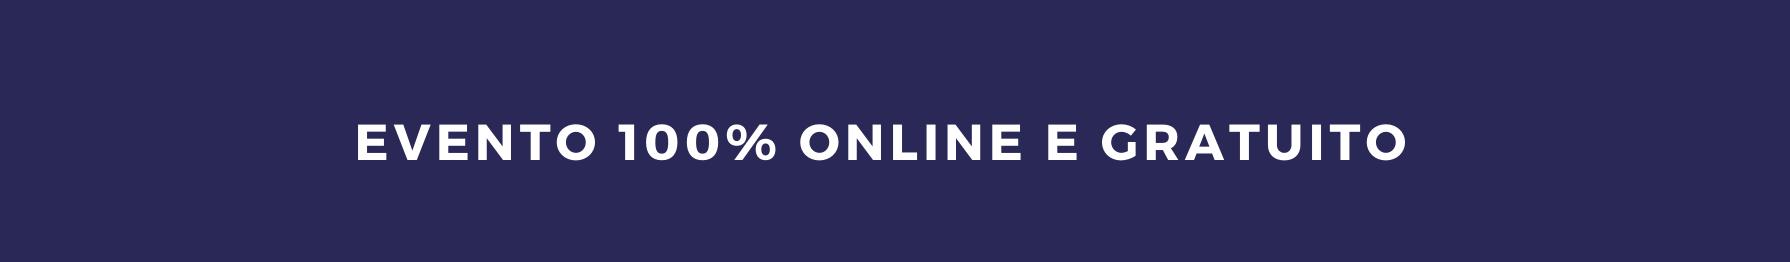 Evento 100% online e gratuito (2)